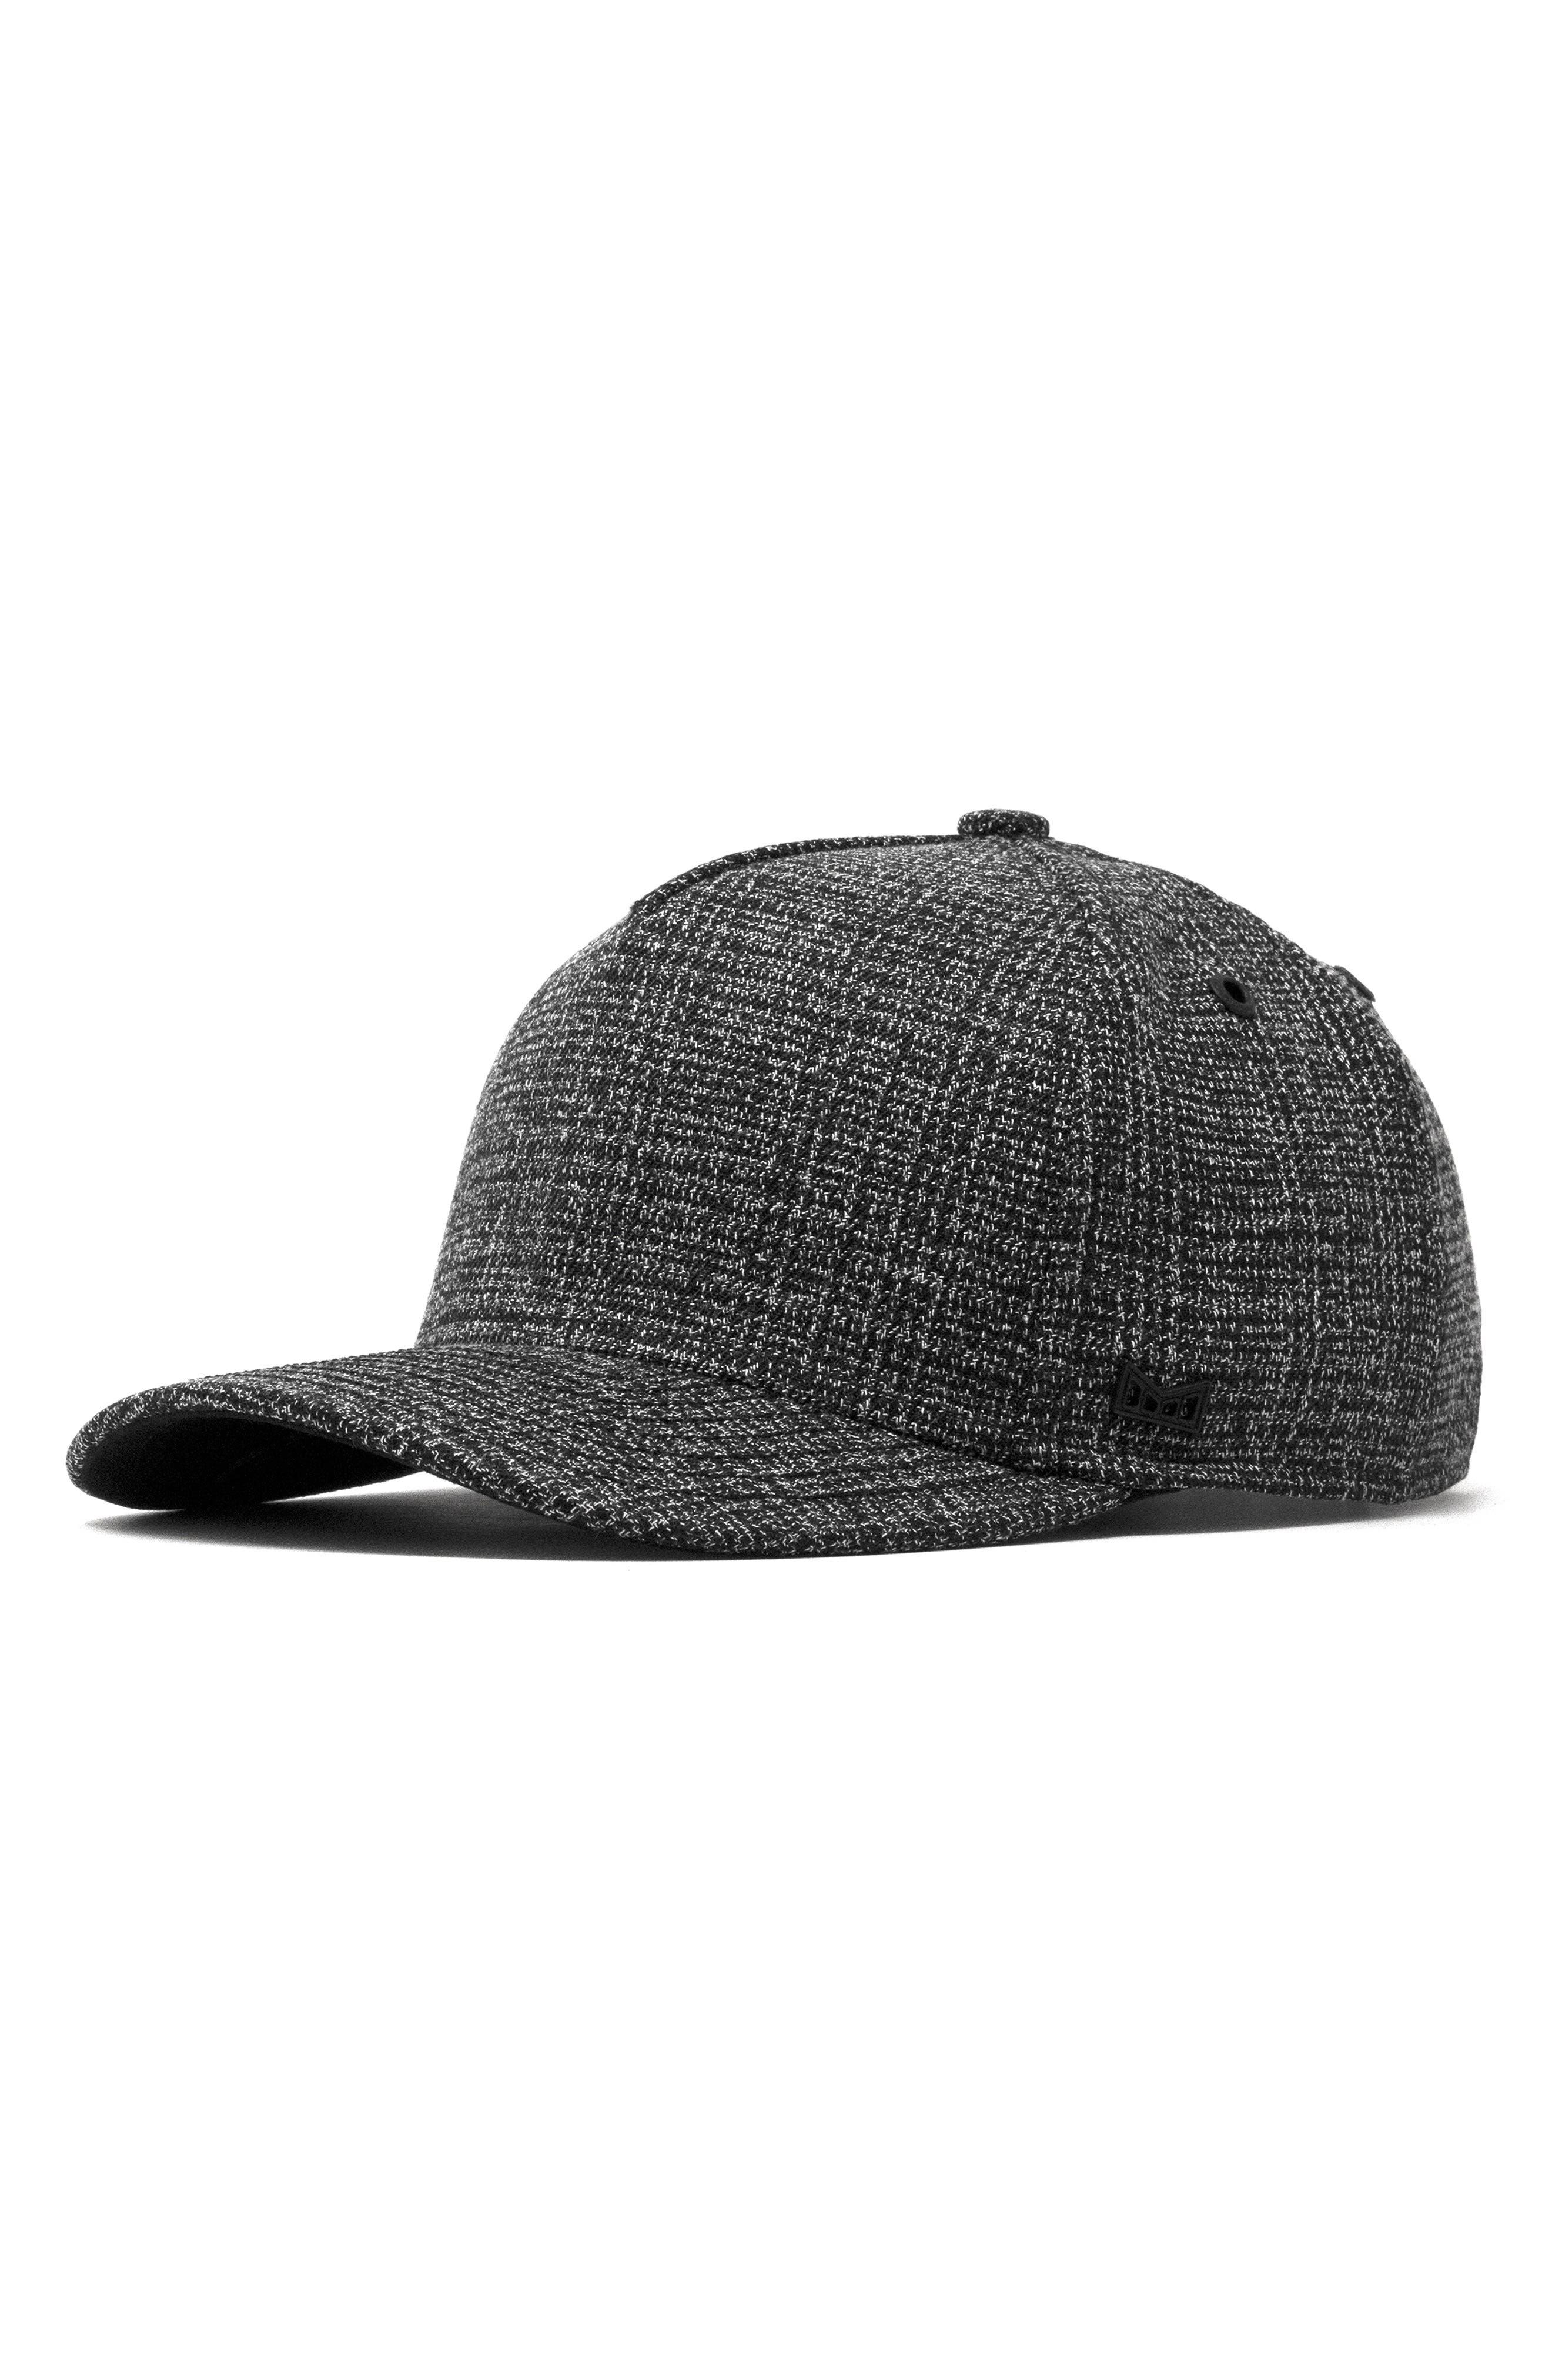 Aberdeen Baseball Cap,                             Main thumbnail 1, color,                             DARK CHARCOAL